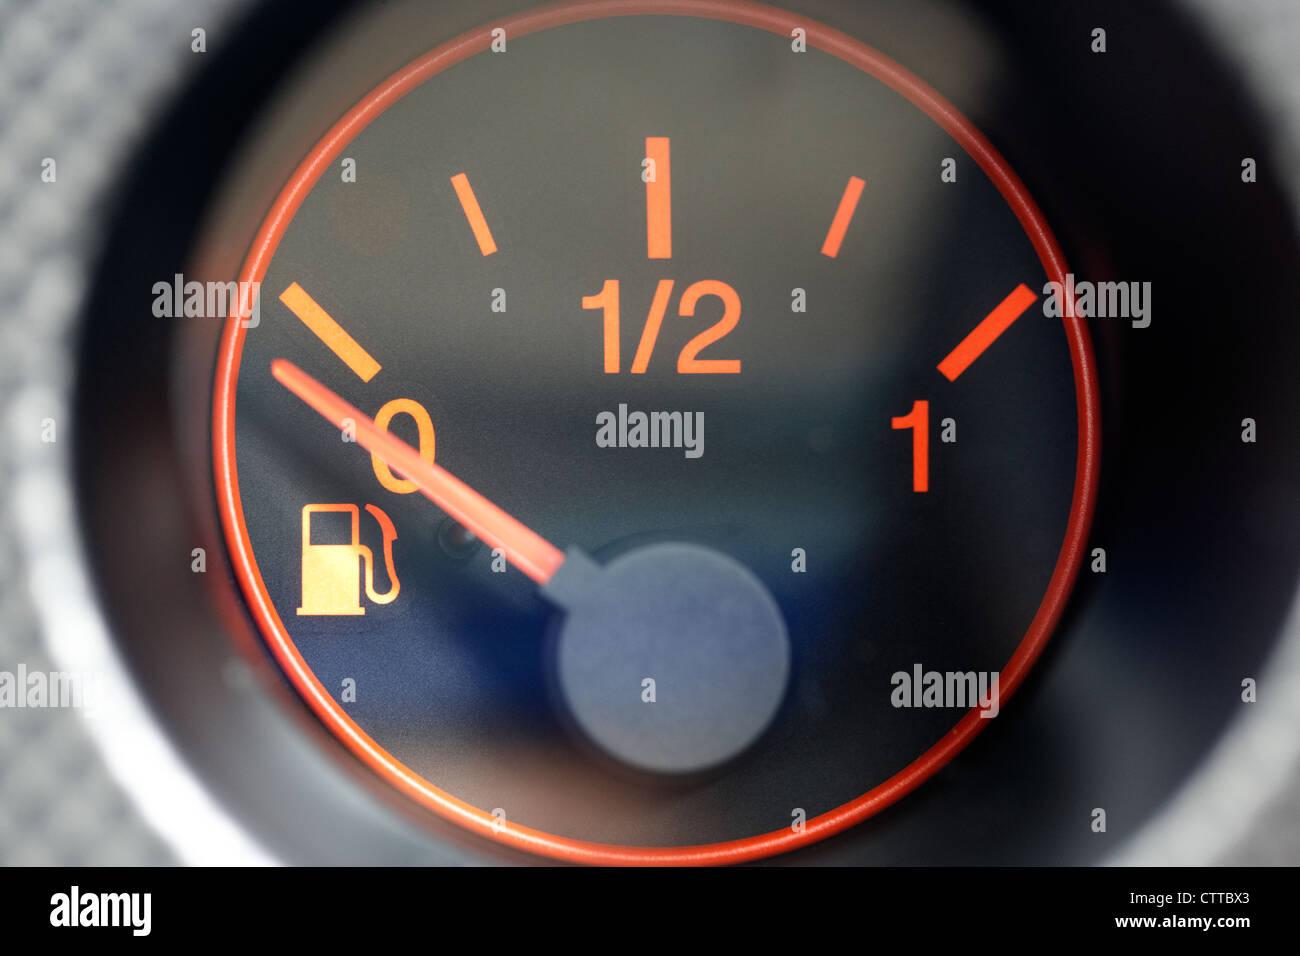 car vehicle fuel gauge showing empty - Stock Image